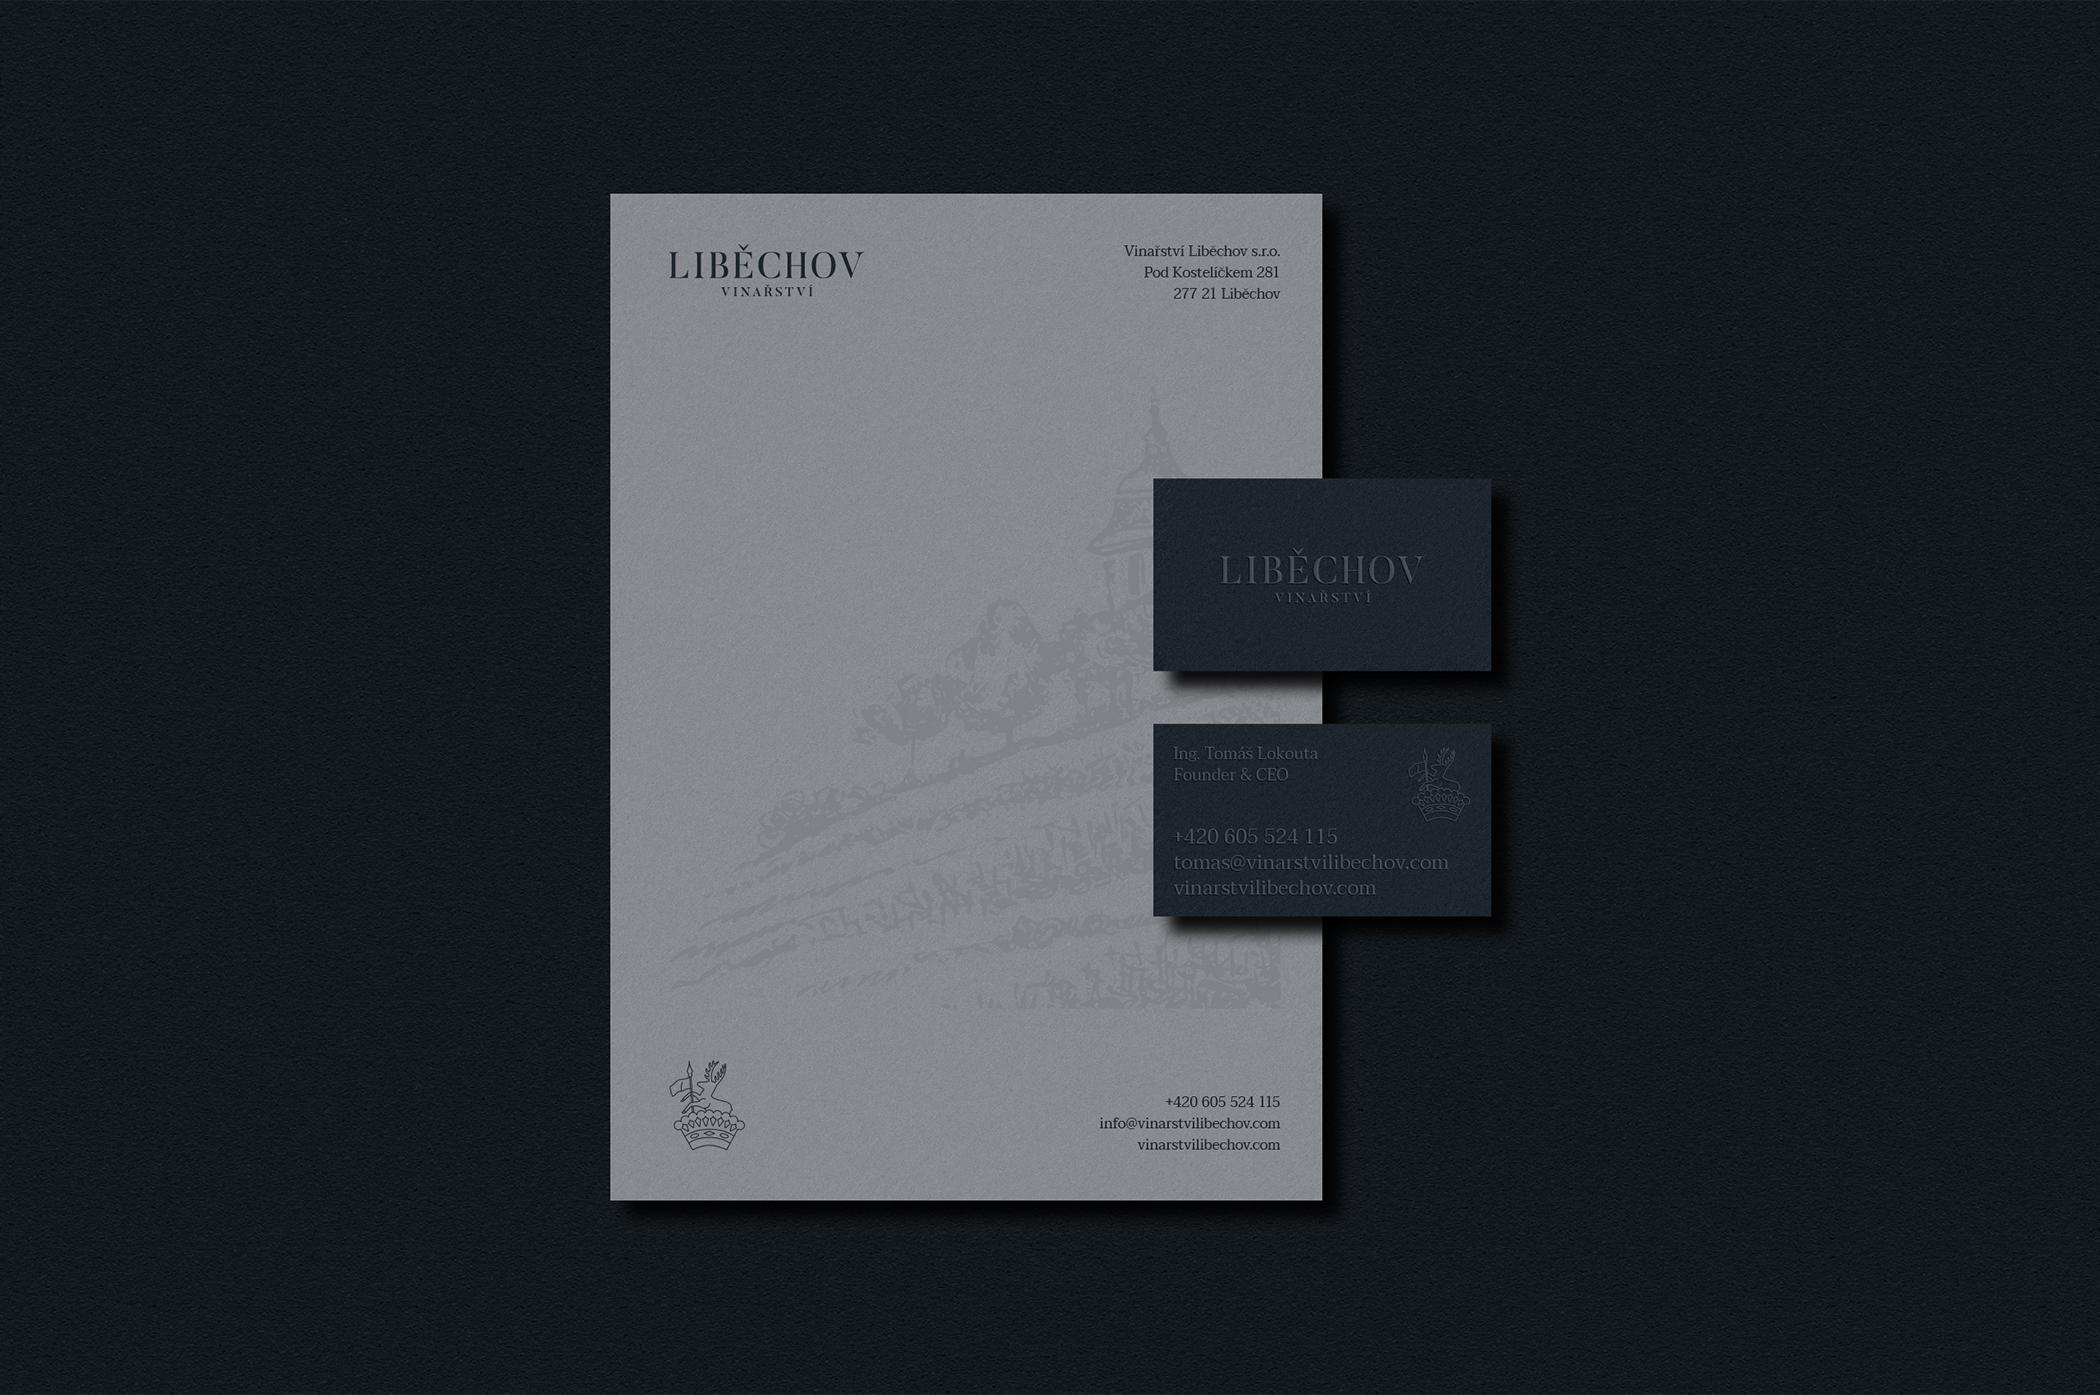 primary-libechov-3